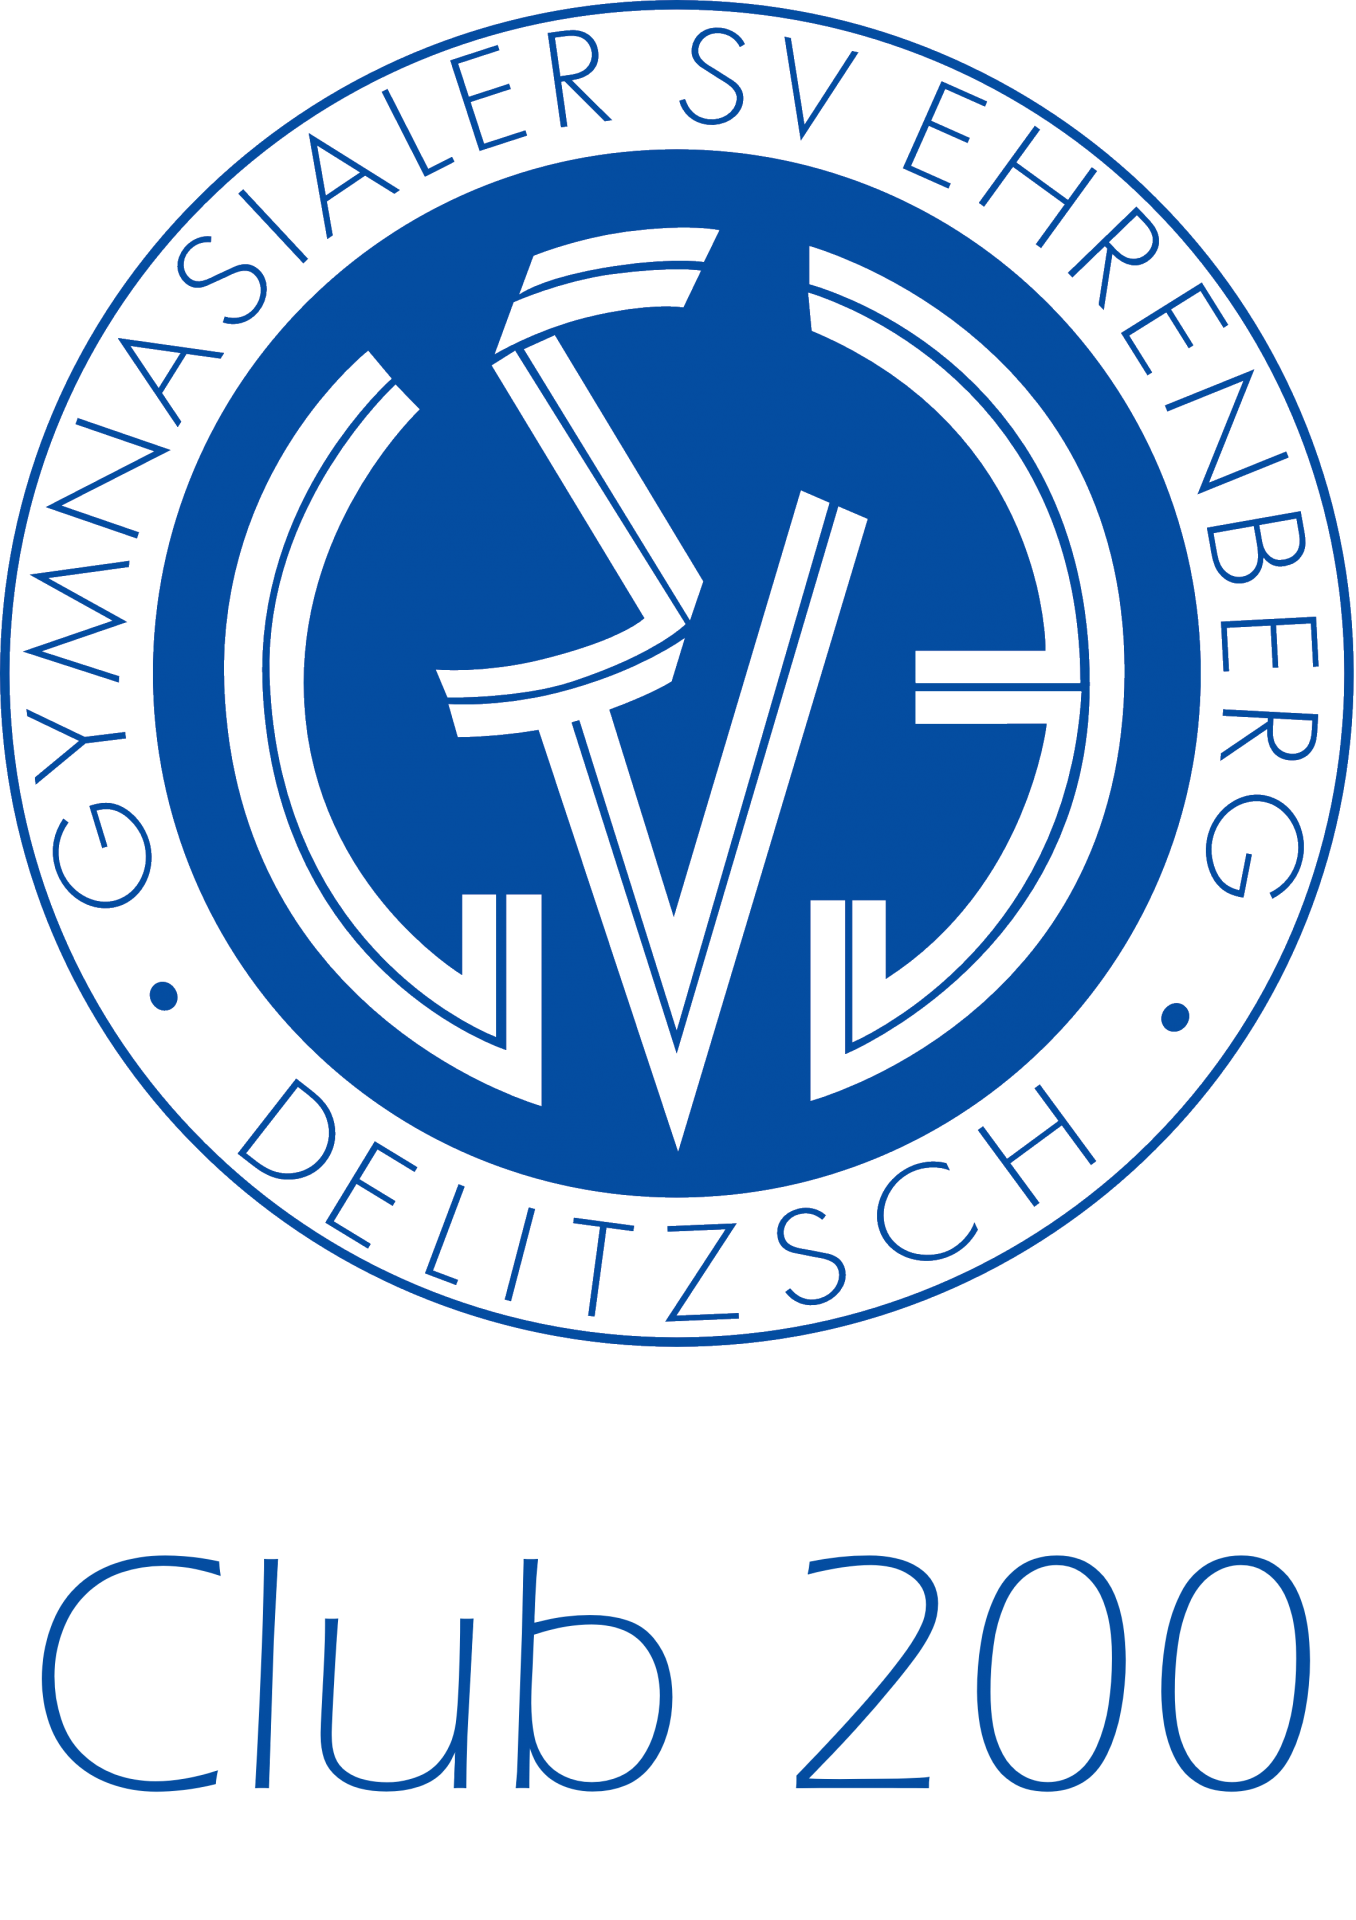 Club200